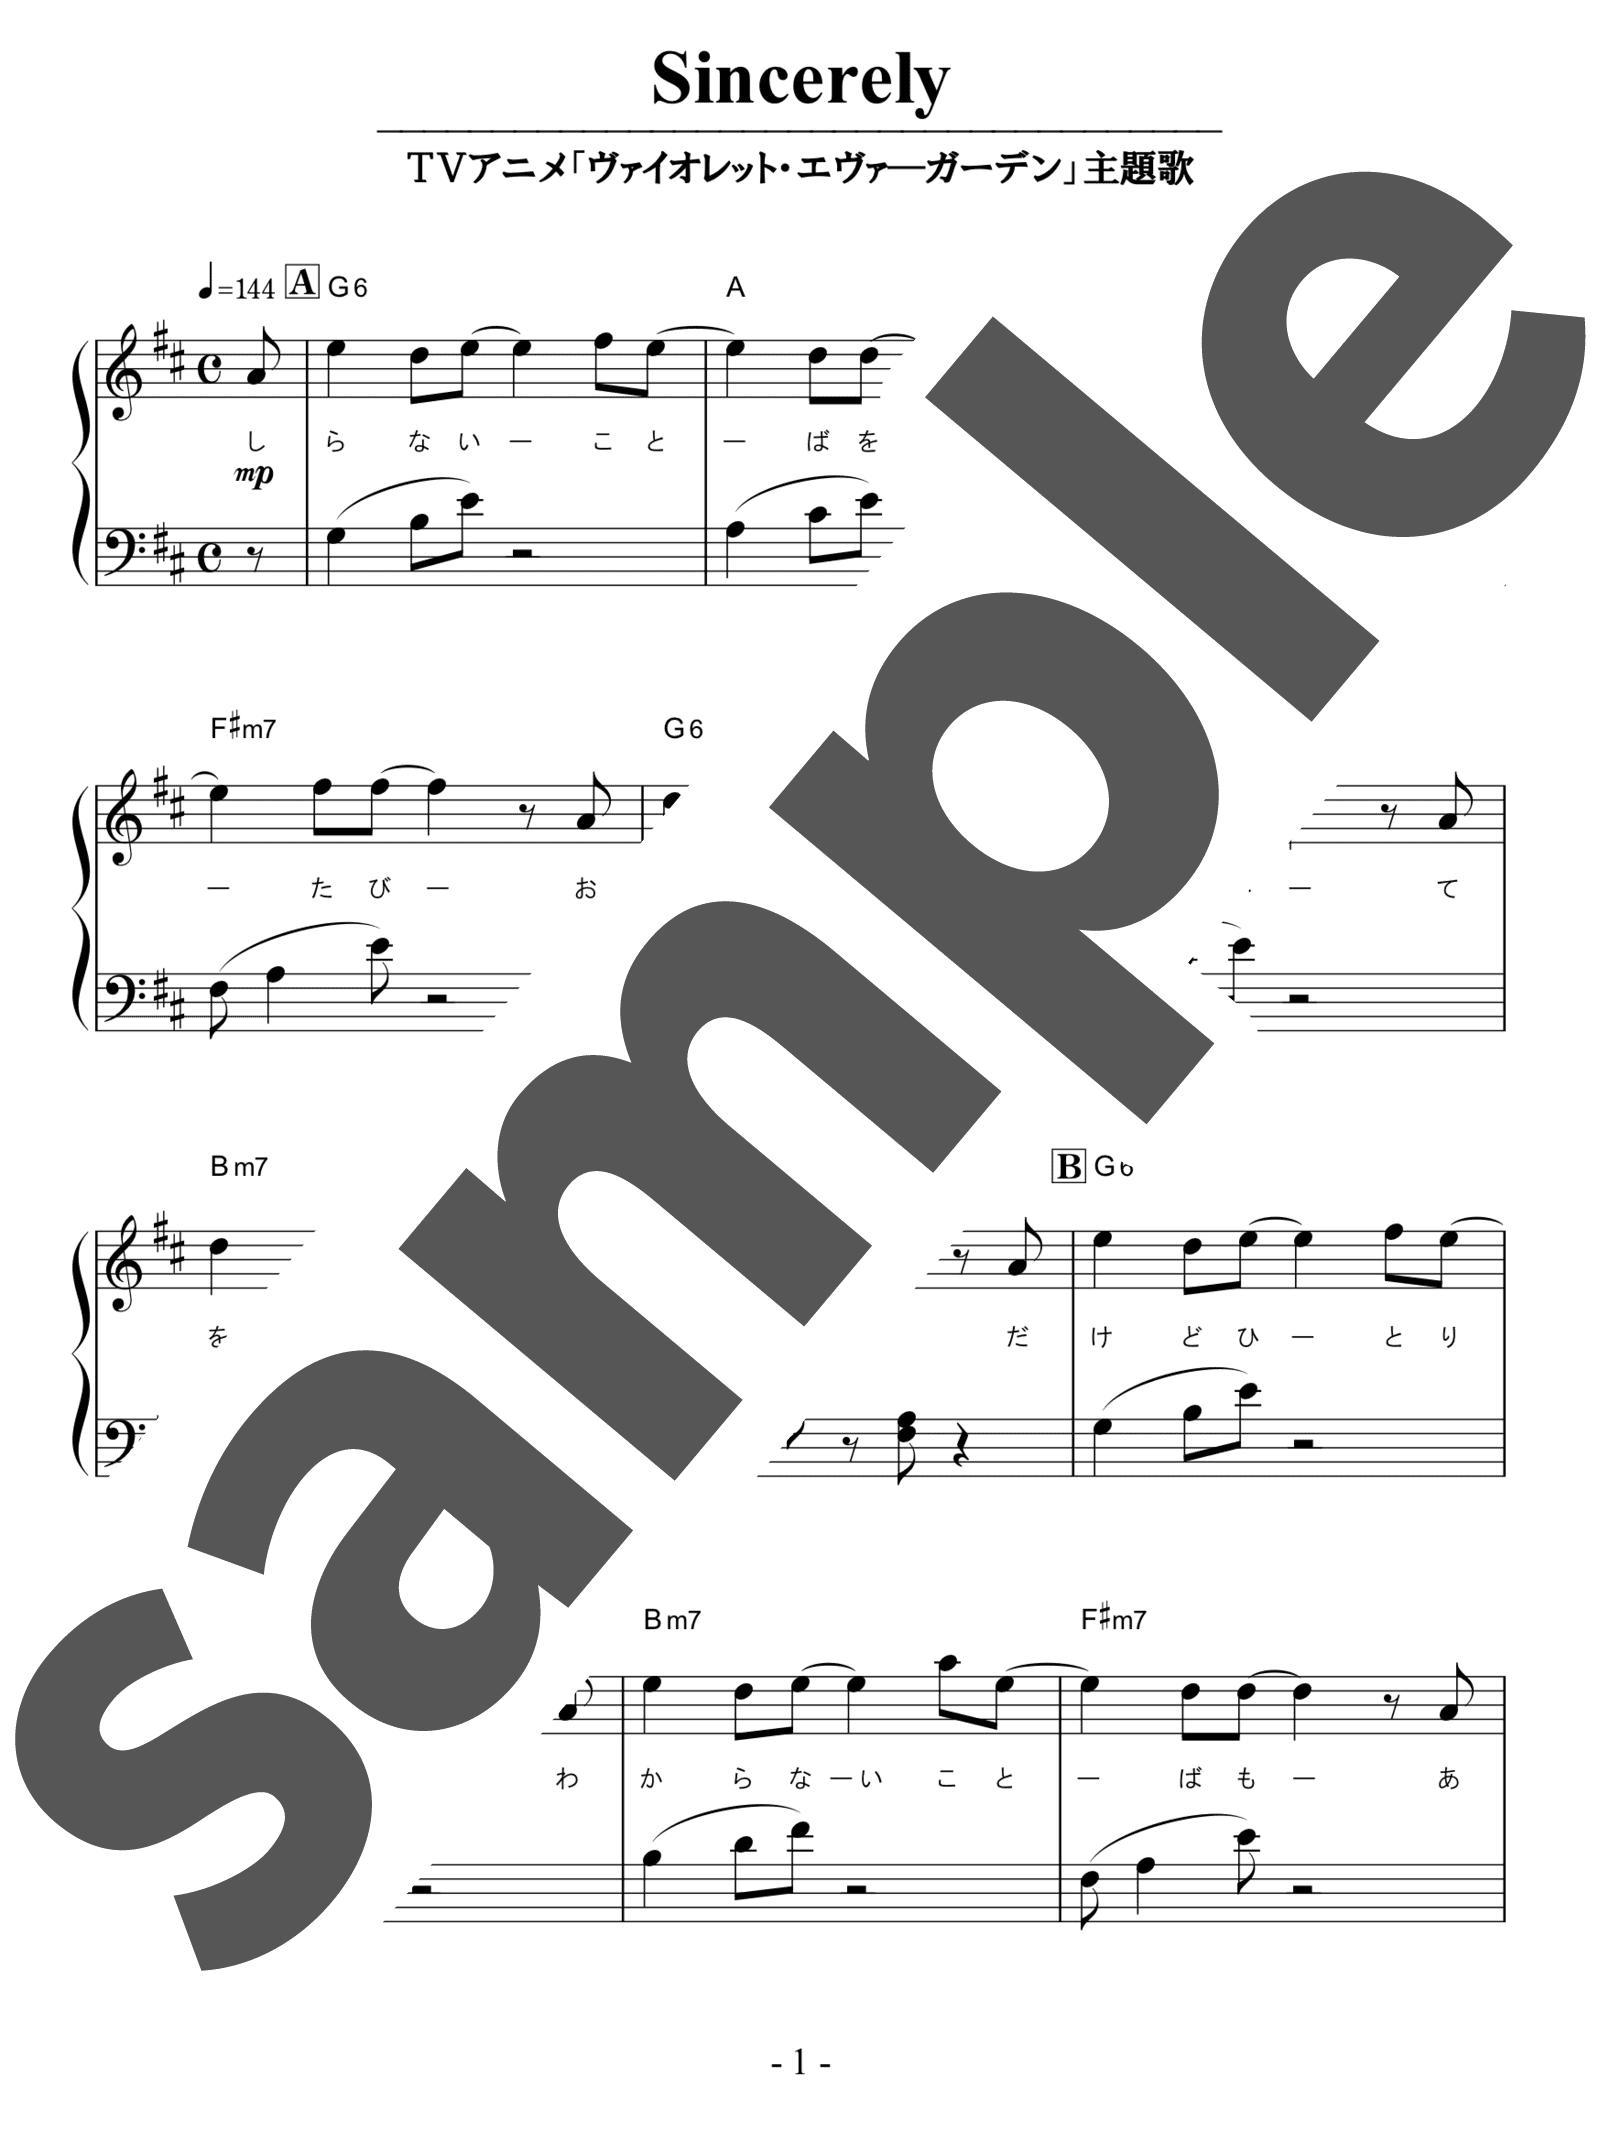 「Sincerely」のサンプル楽譜